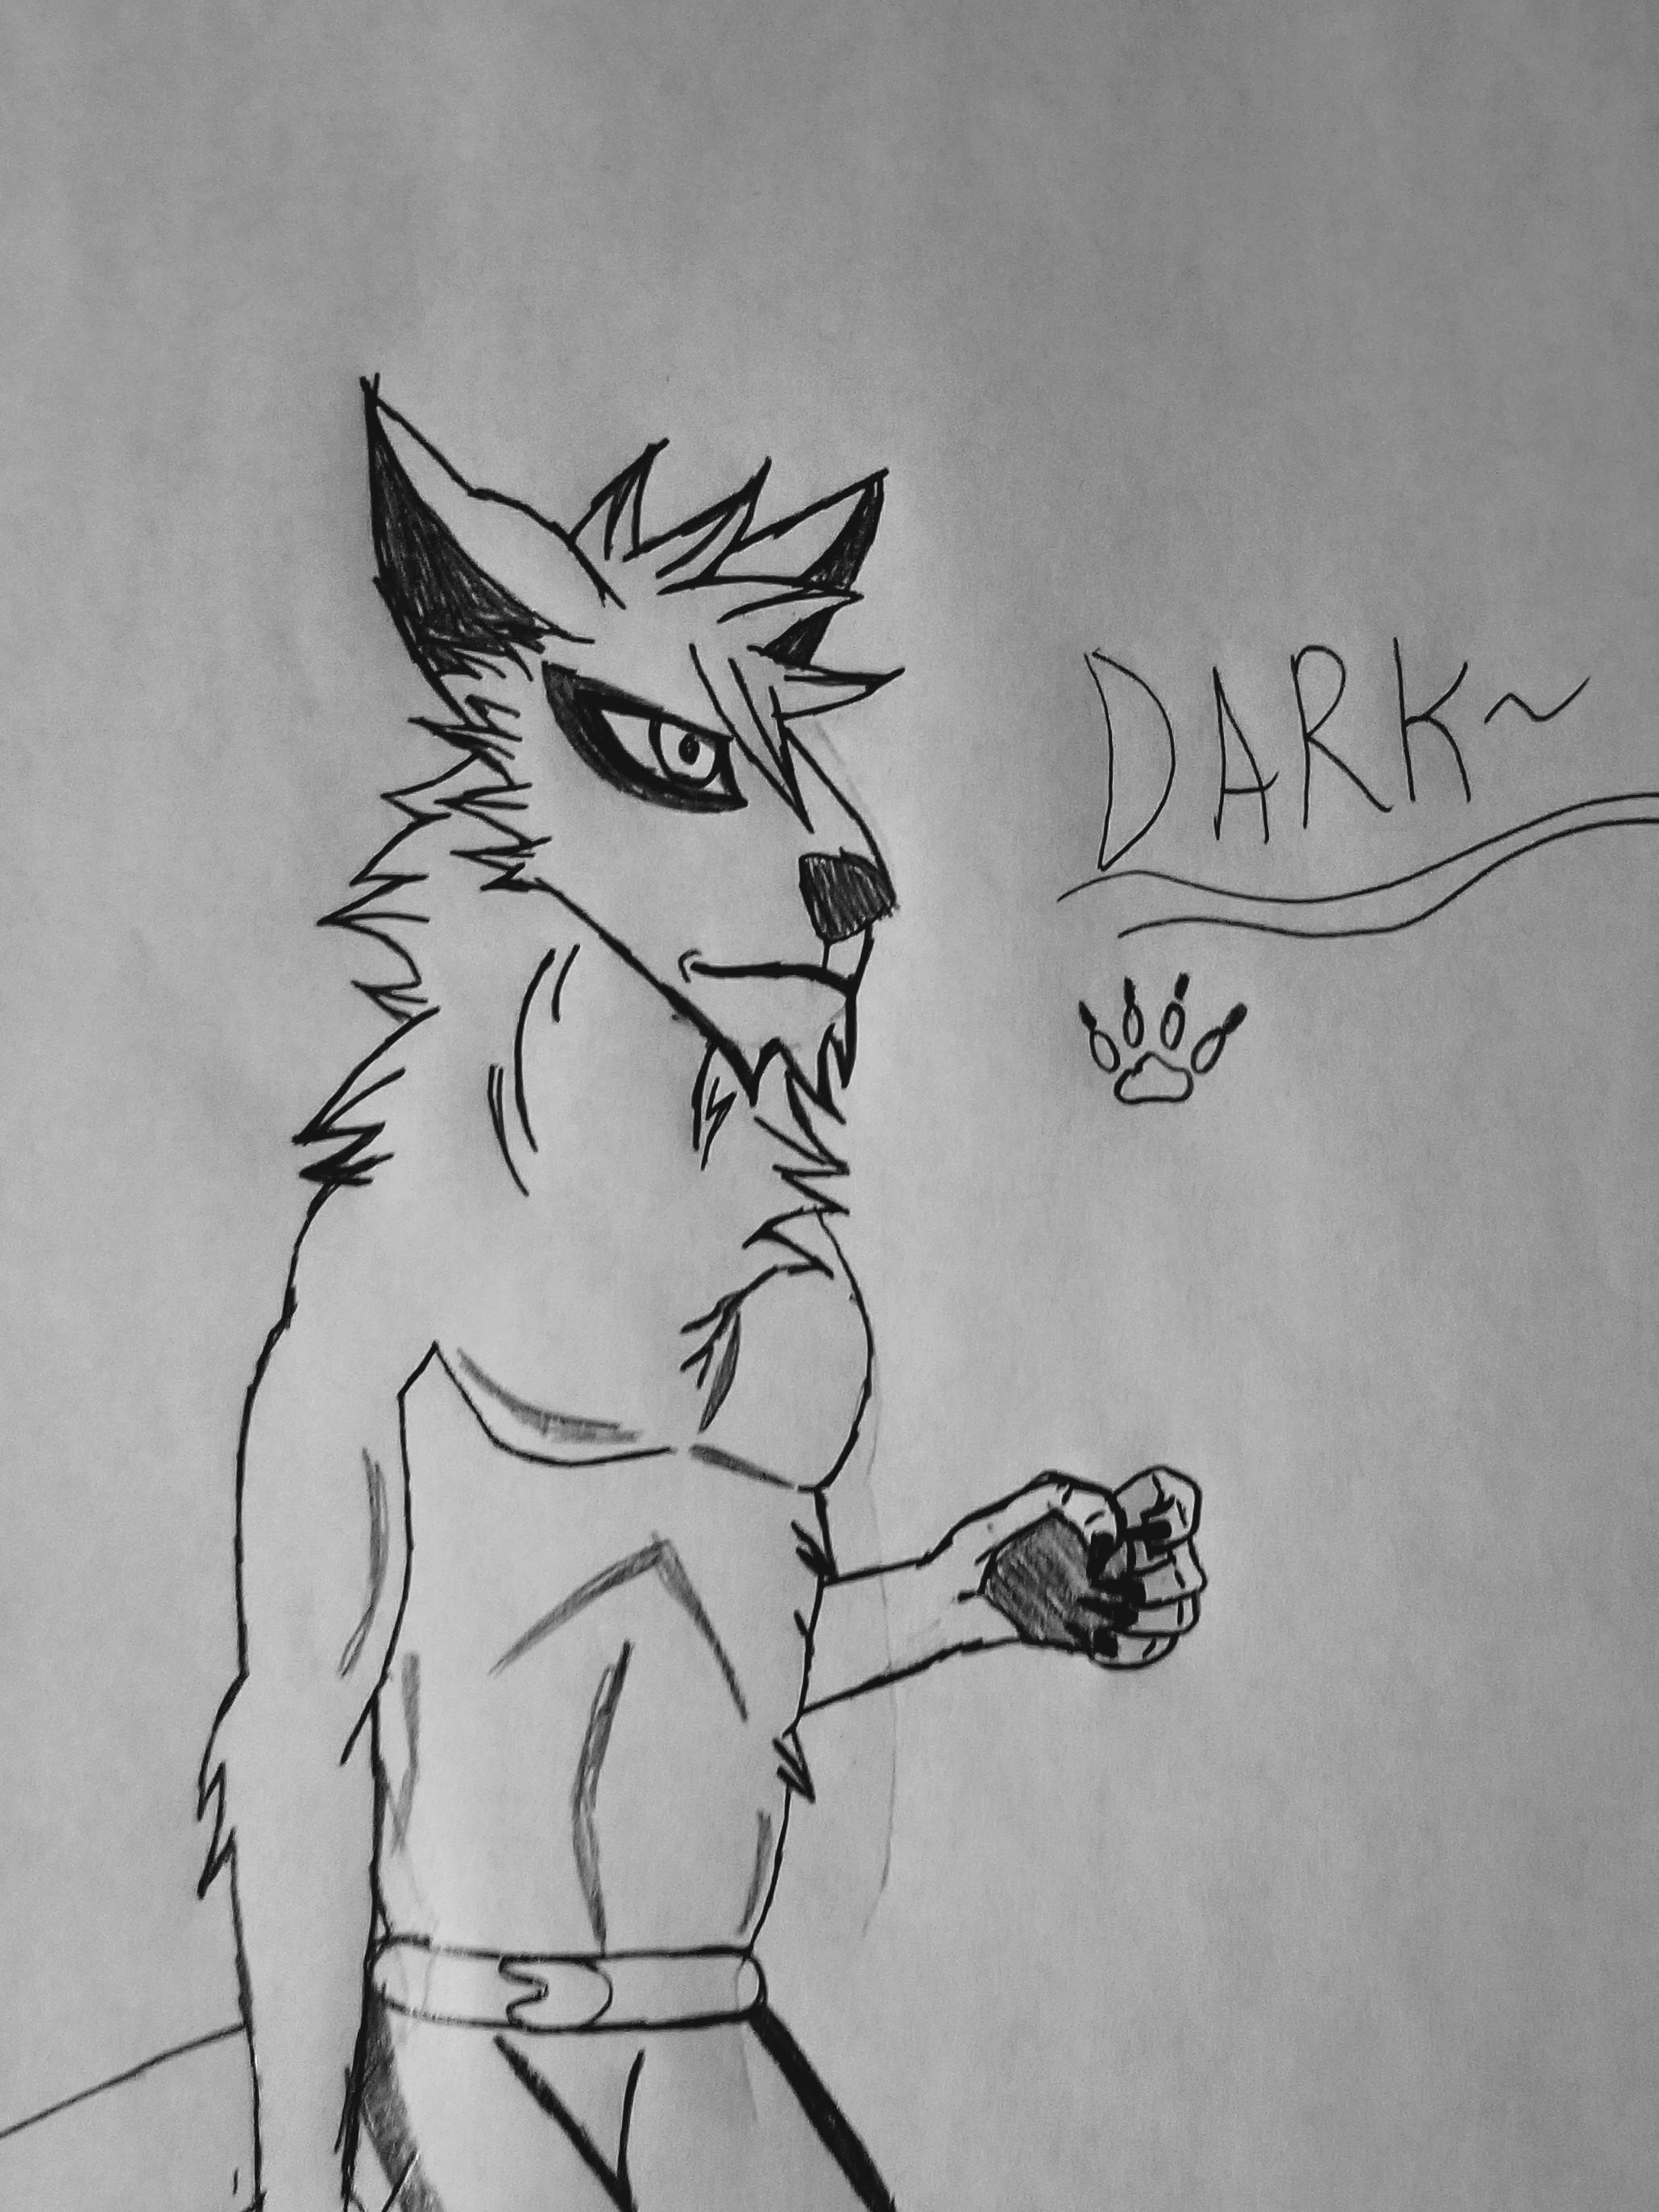 Dark's Fursona Avatar